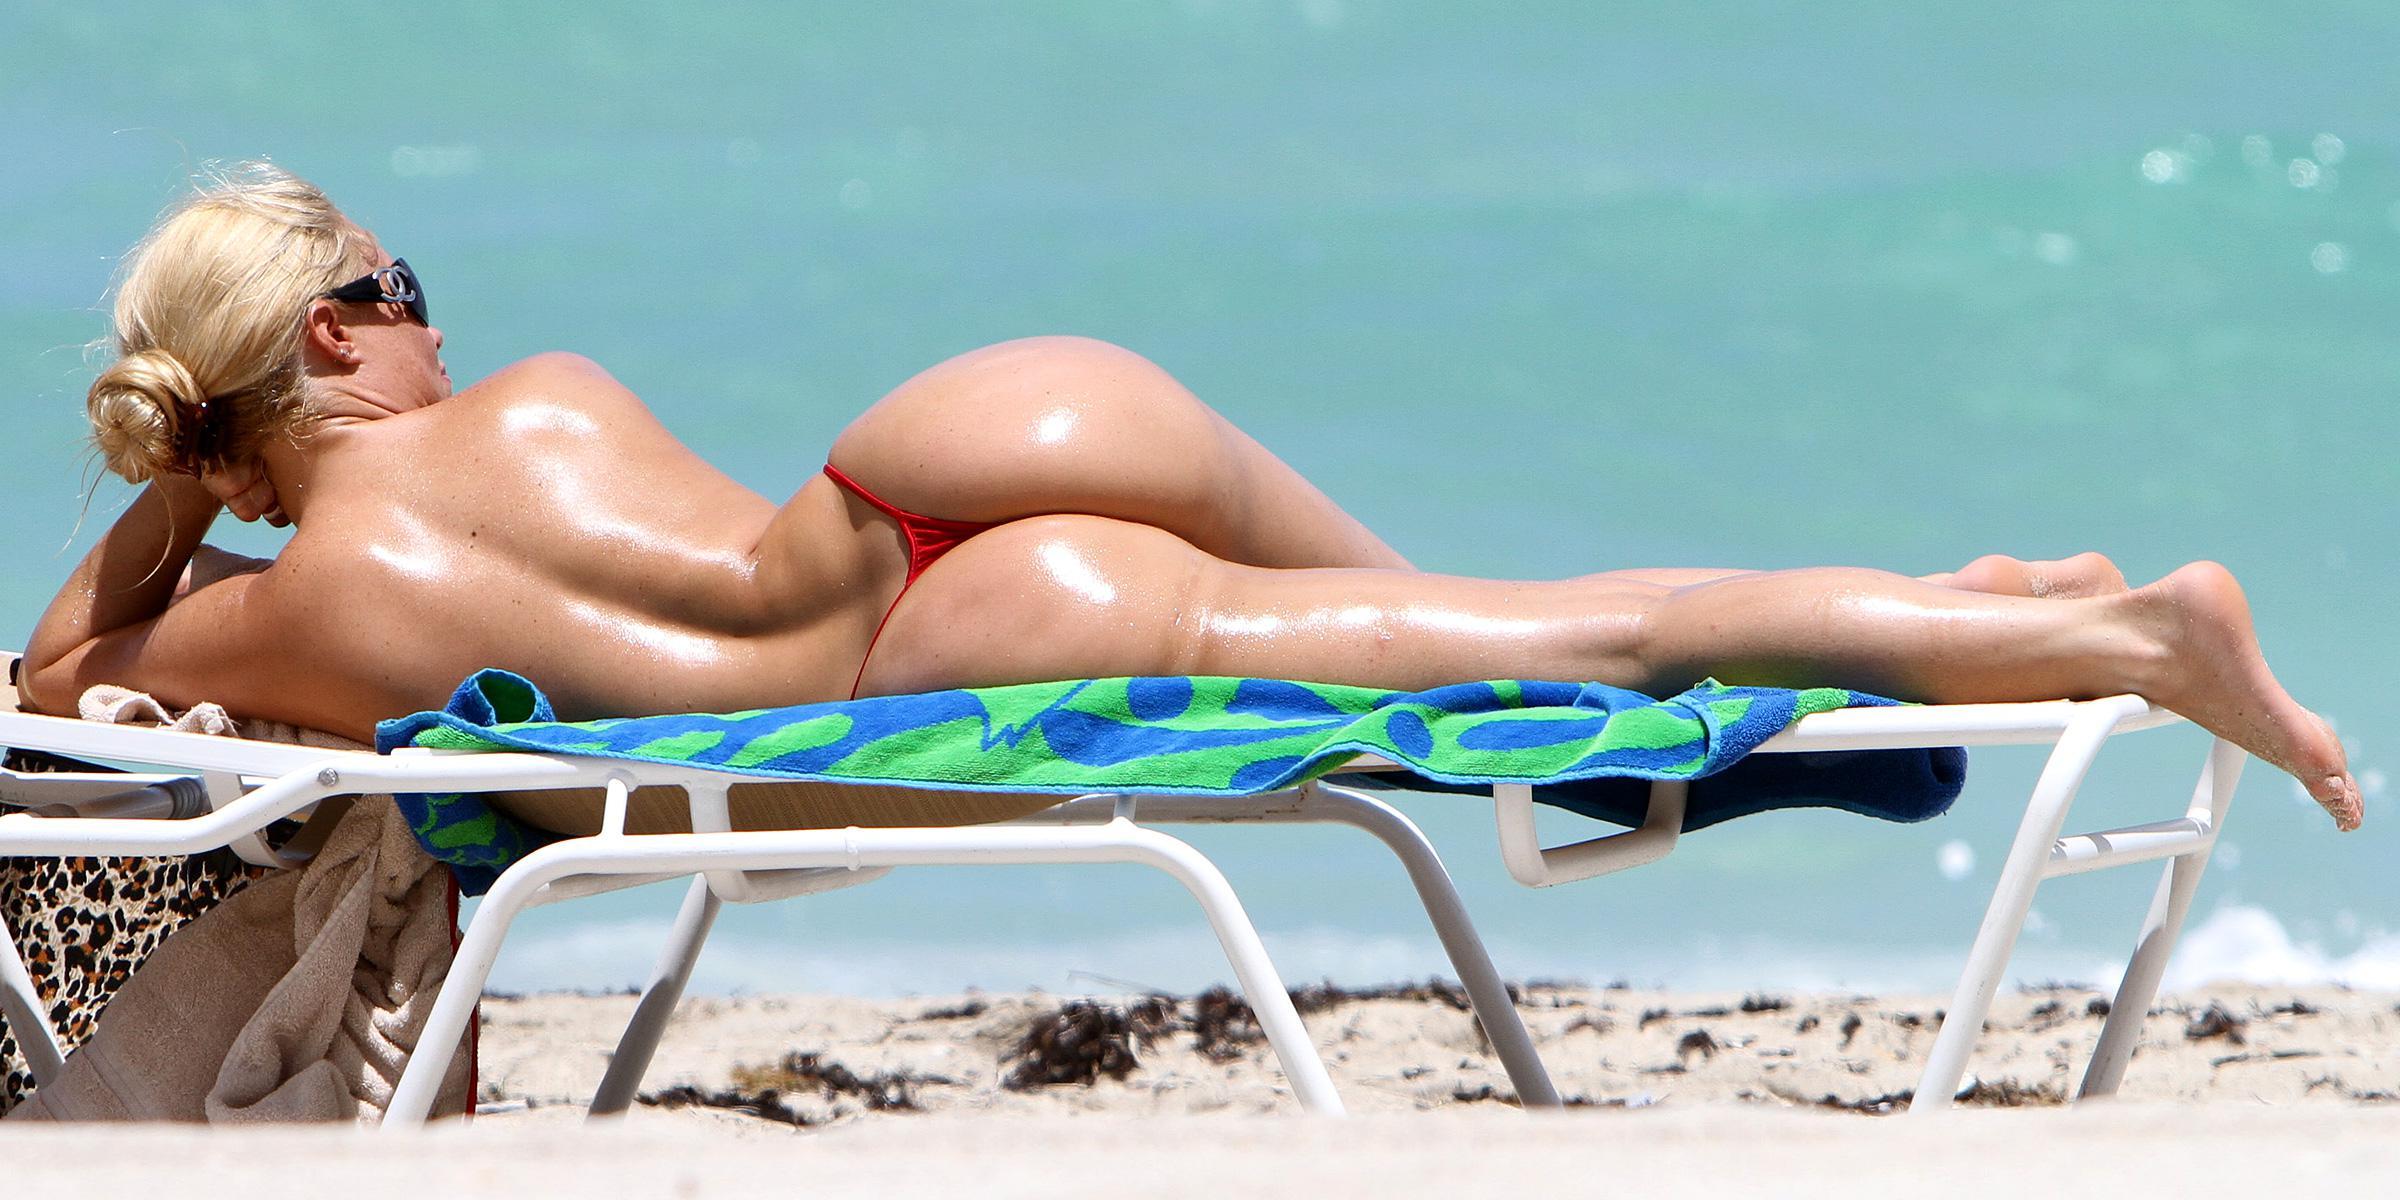 Nude woman of miami